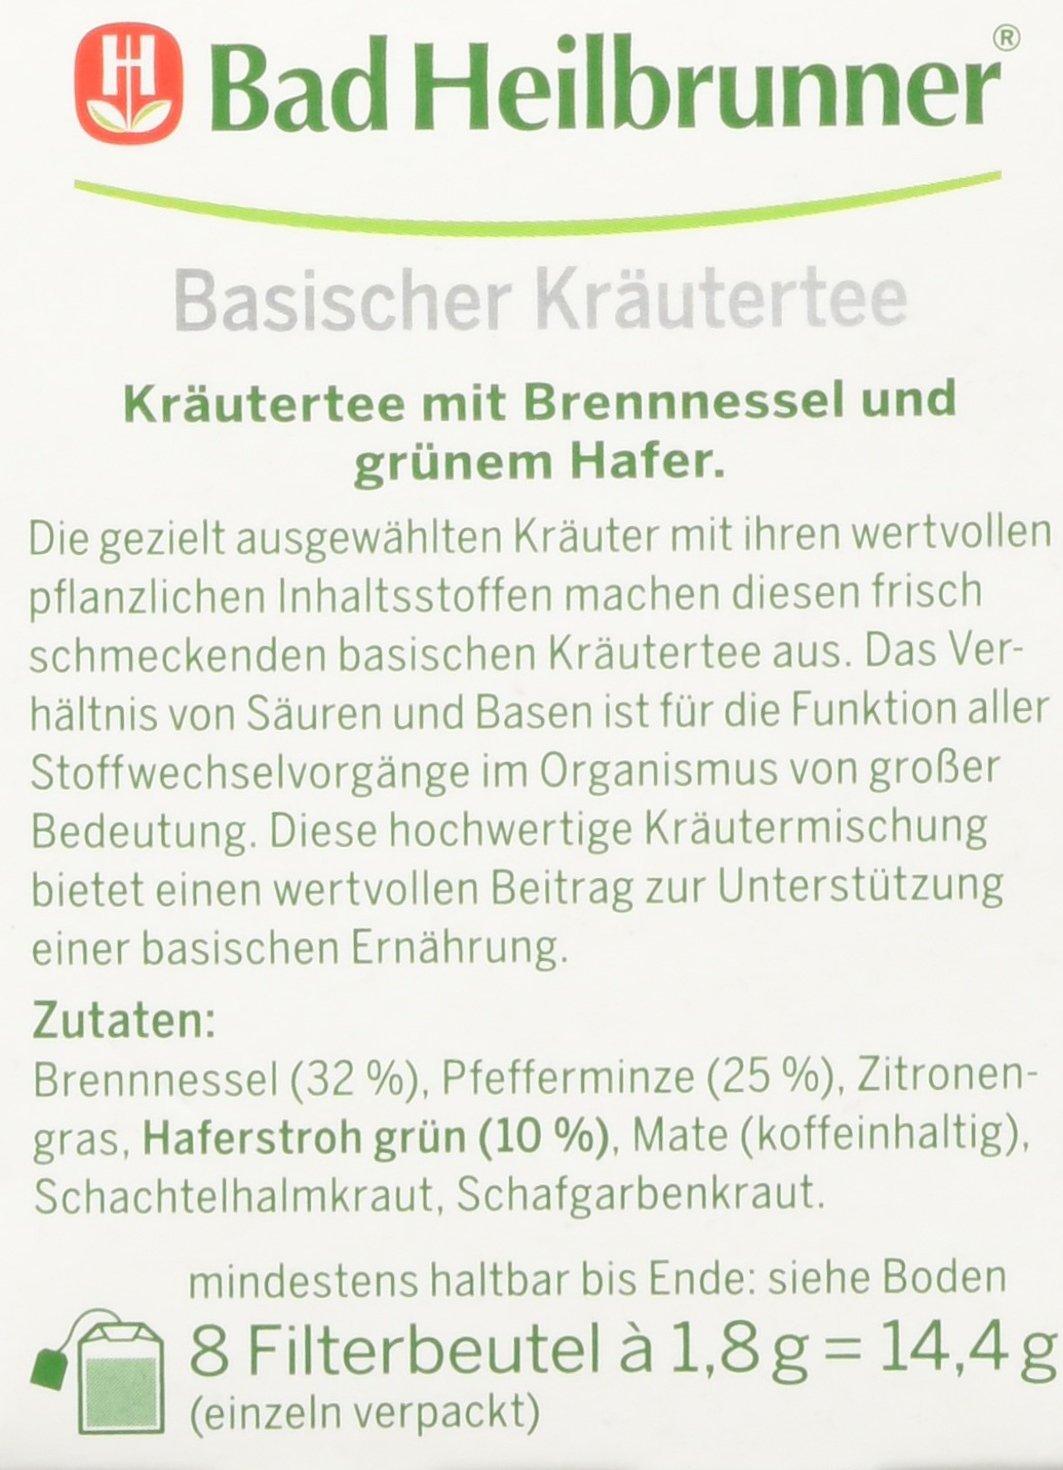 Bad-Heilbrunner-Basischer-Krutertee-8er-Filterbeutel